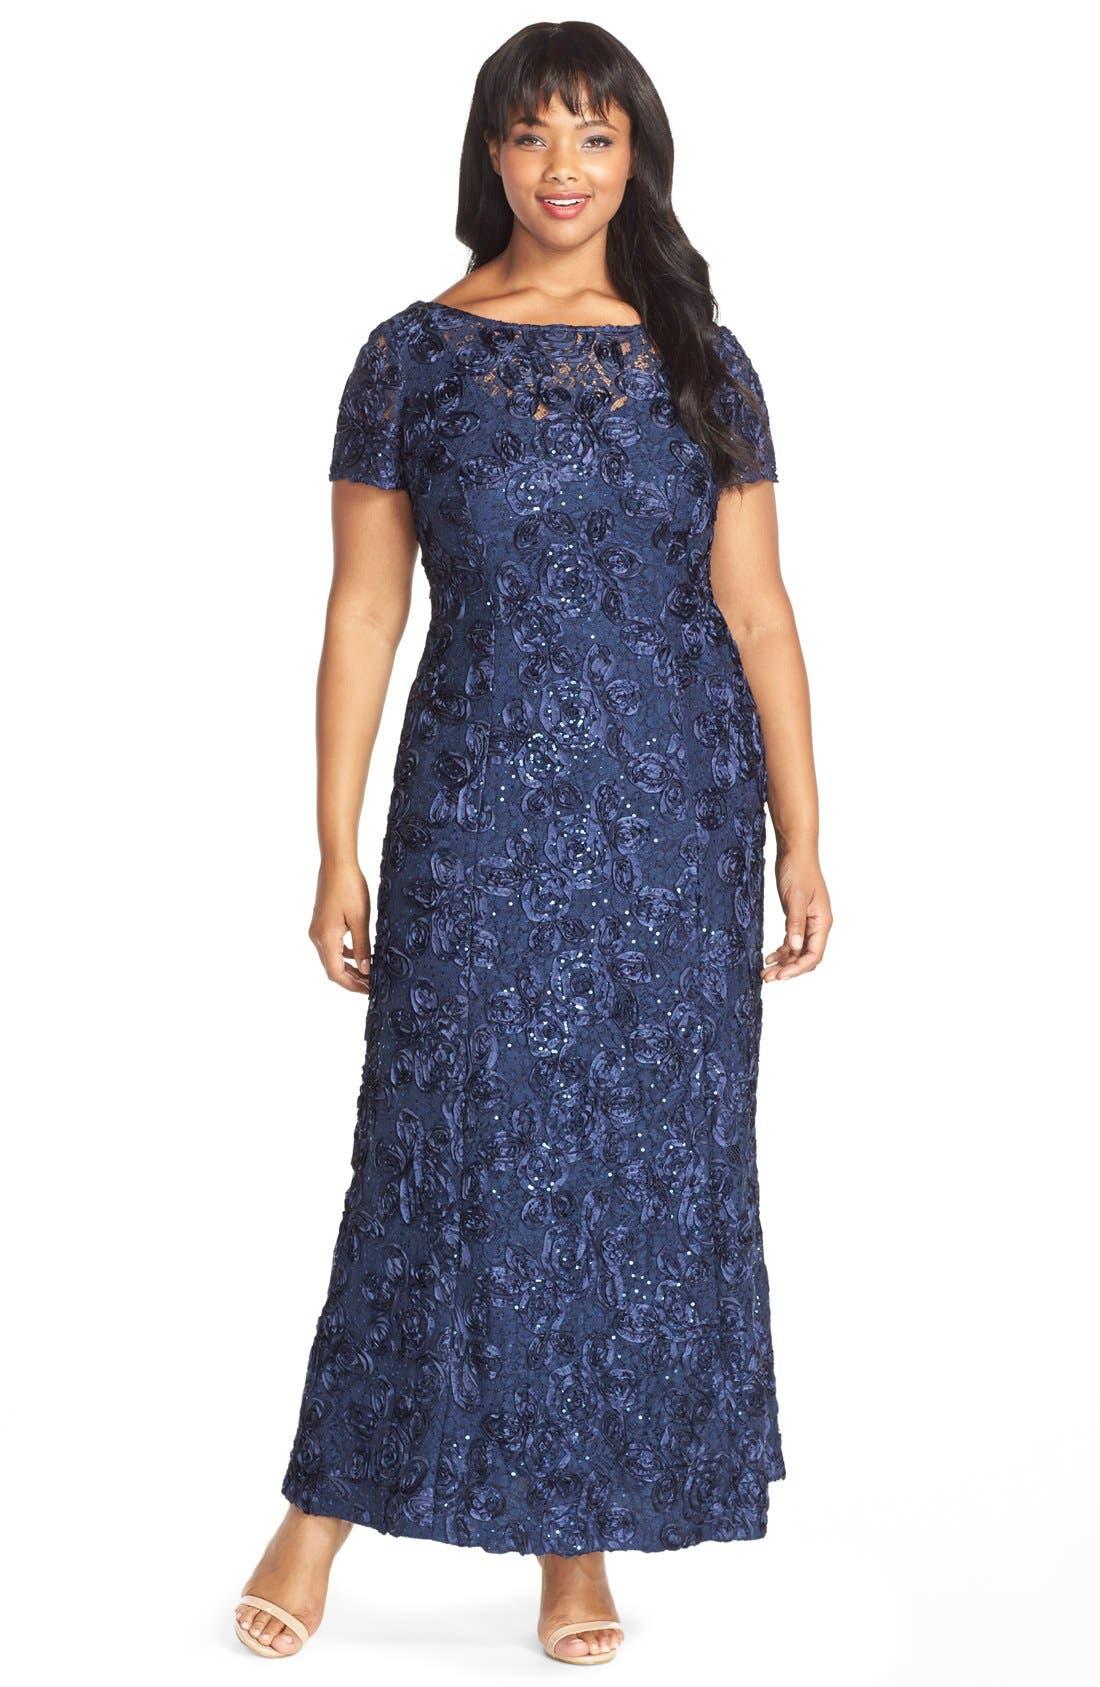 Rosette Lace Short Sleeve A-Line Gown,                             Main thumbnail 1, color,                             NAVY